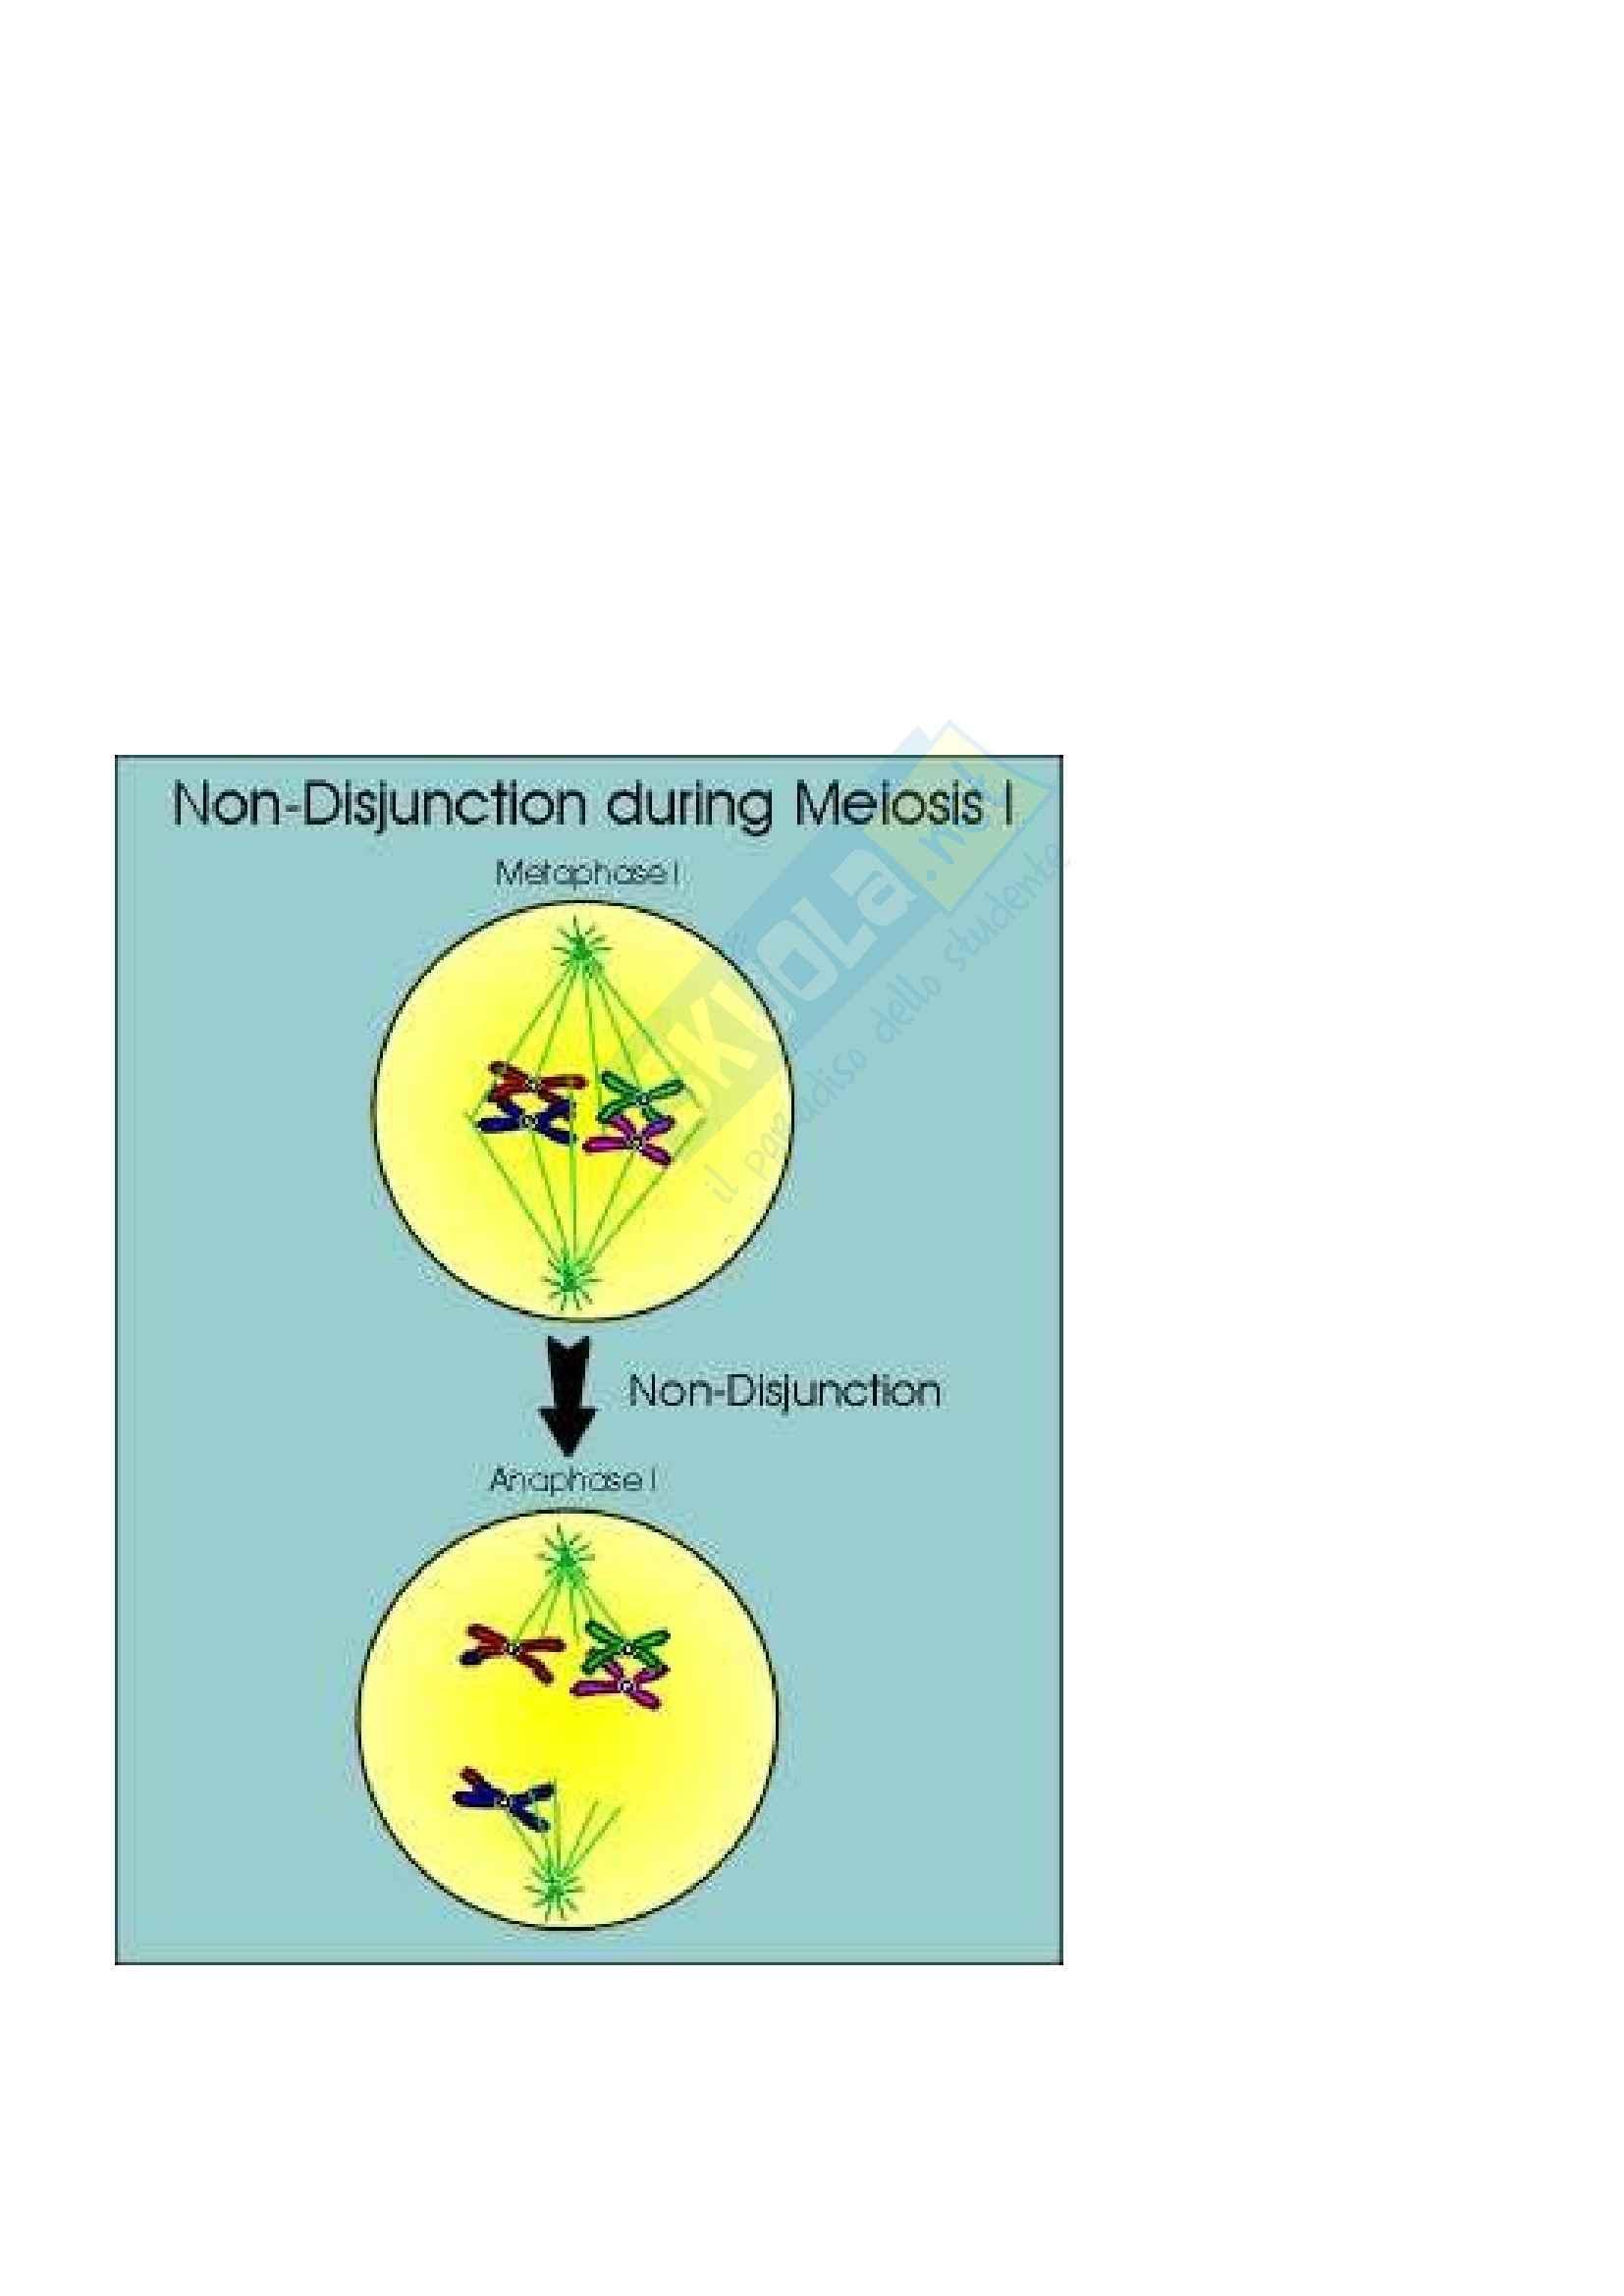 Basi biologiche e genetica umana - mutazioni geniche Pag. 51